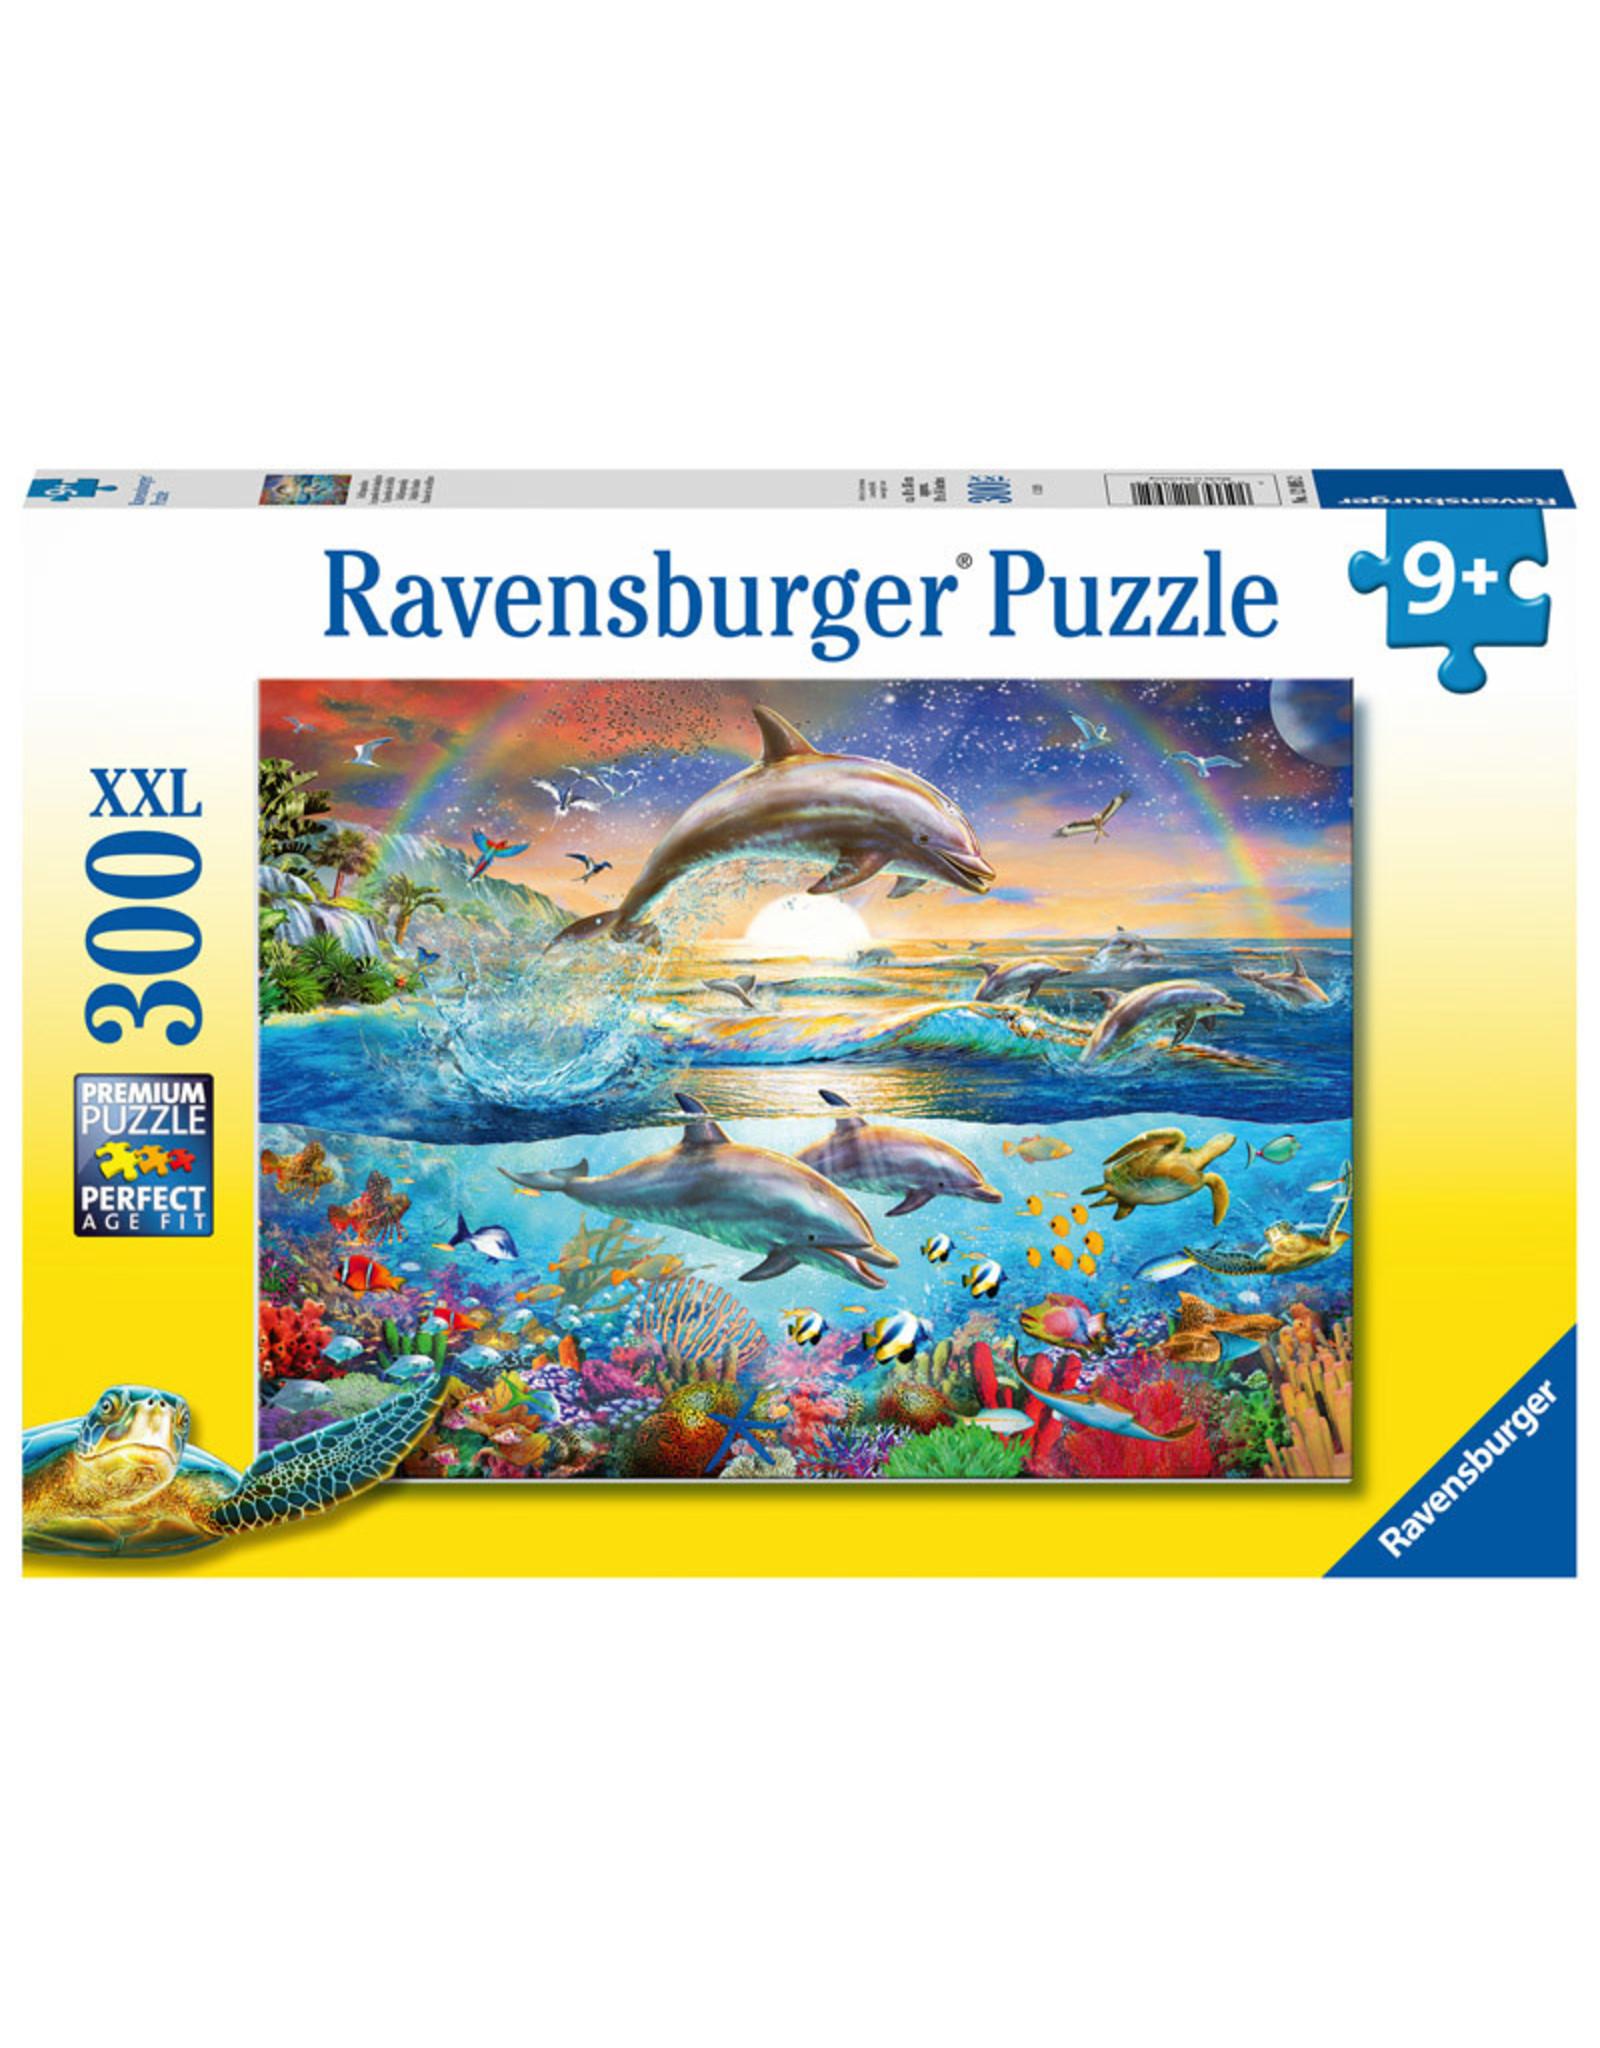 Ravensburger Dolphin Paradise 300pc